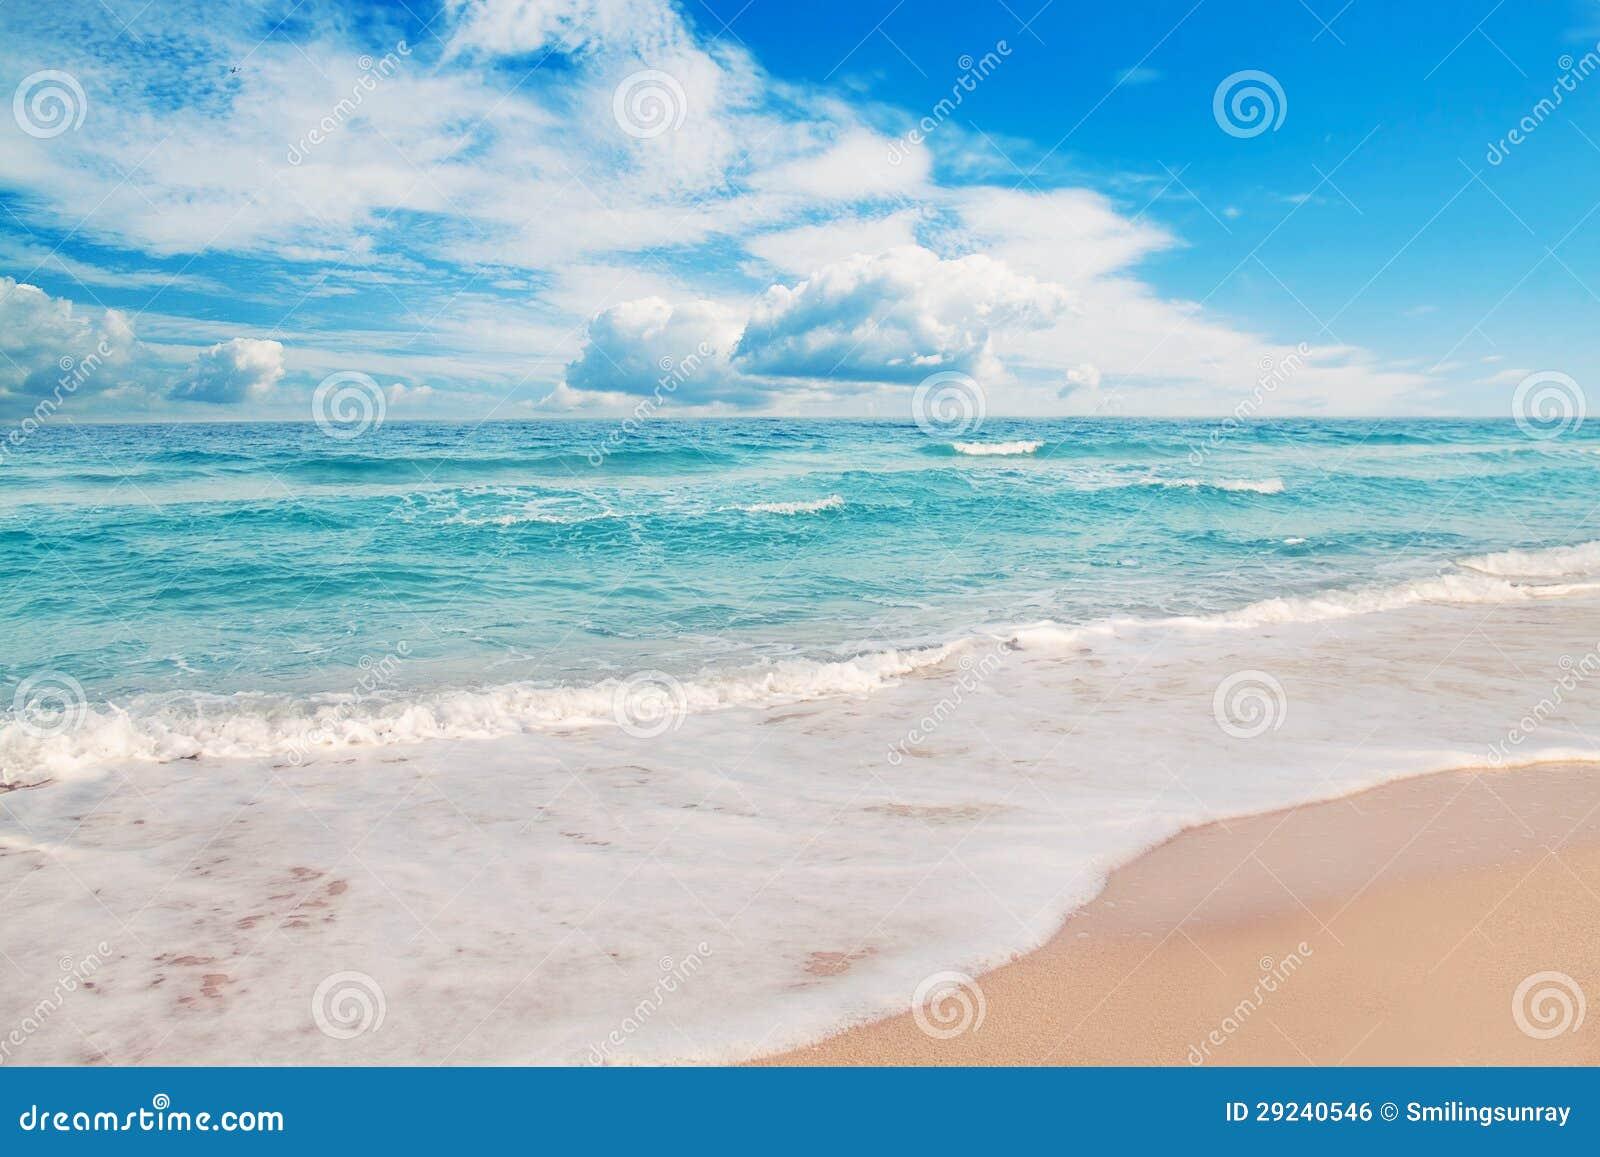 Download Praia idílico foto de stock. Imagem de cloudscape, idyllic - 29240546